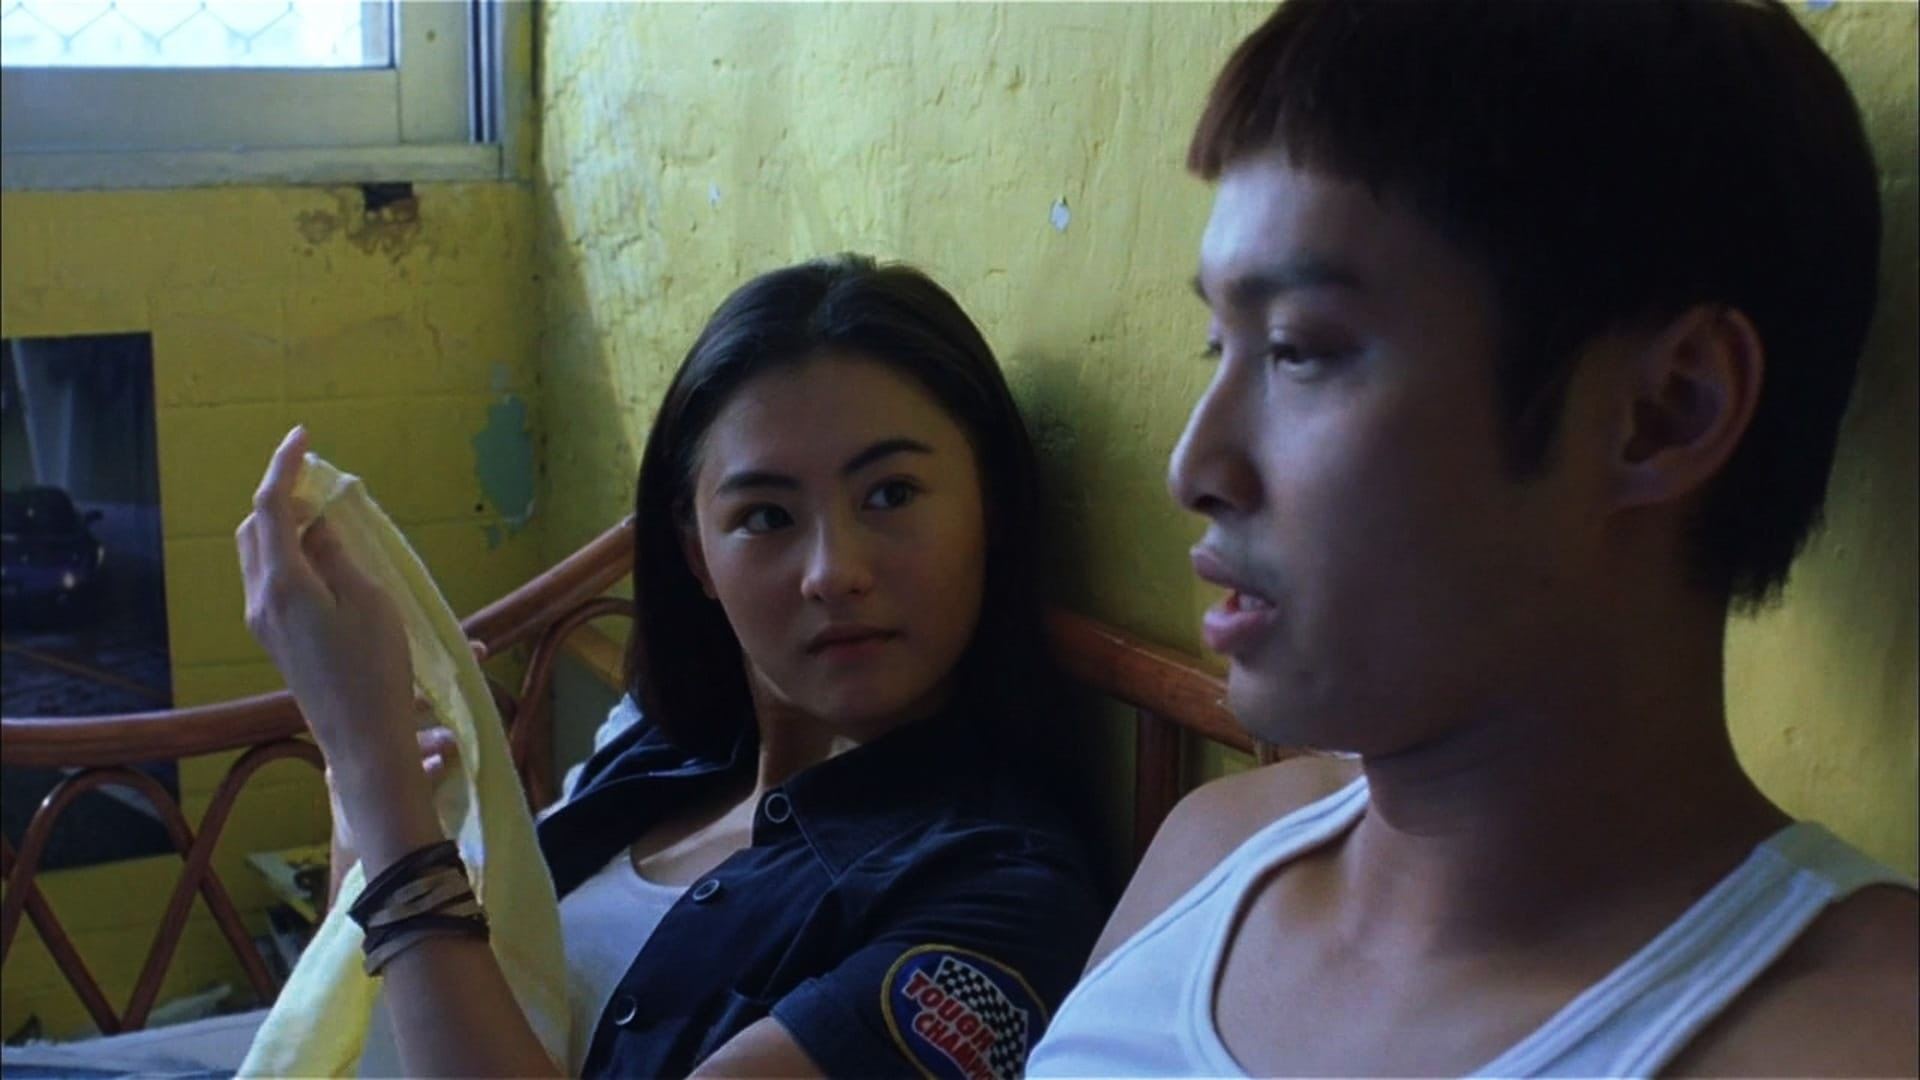 Lit foh chin che 2: Git suk chuen suet (1999)